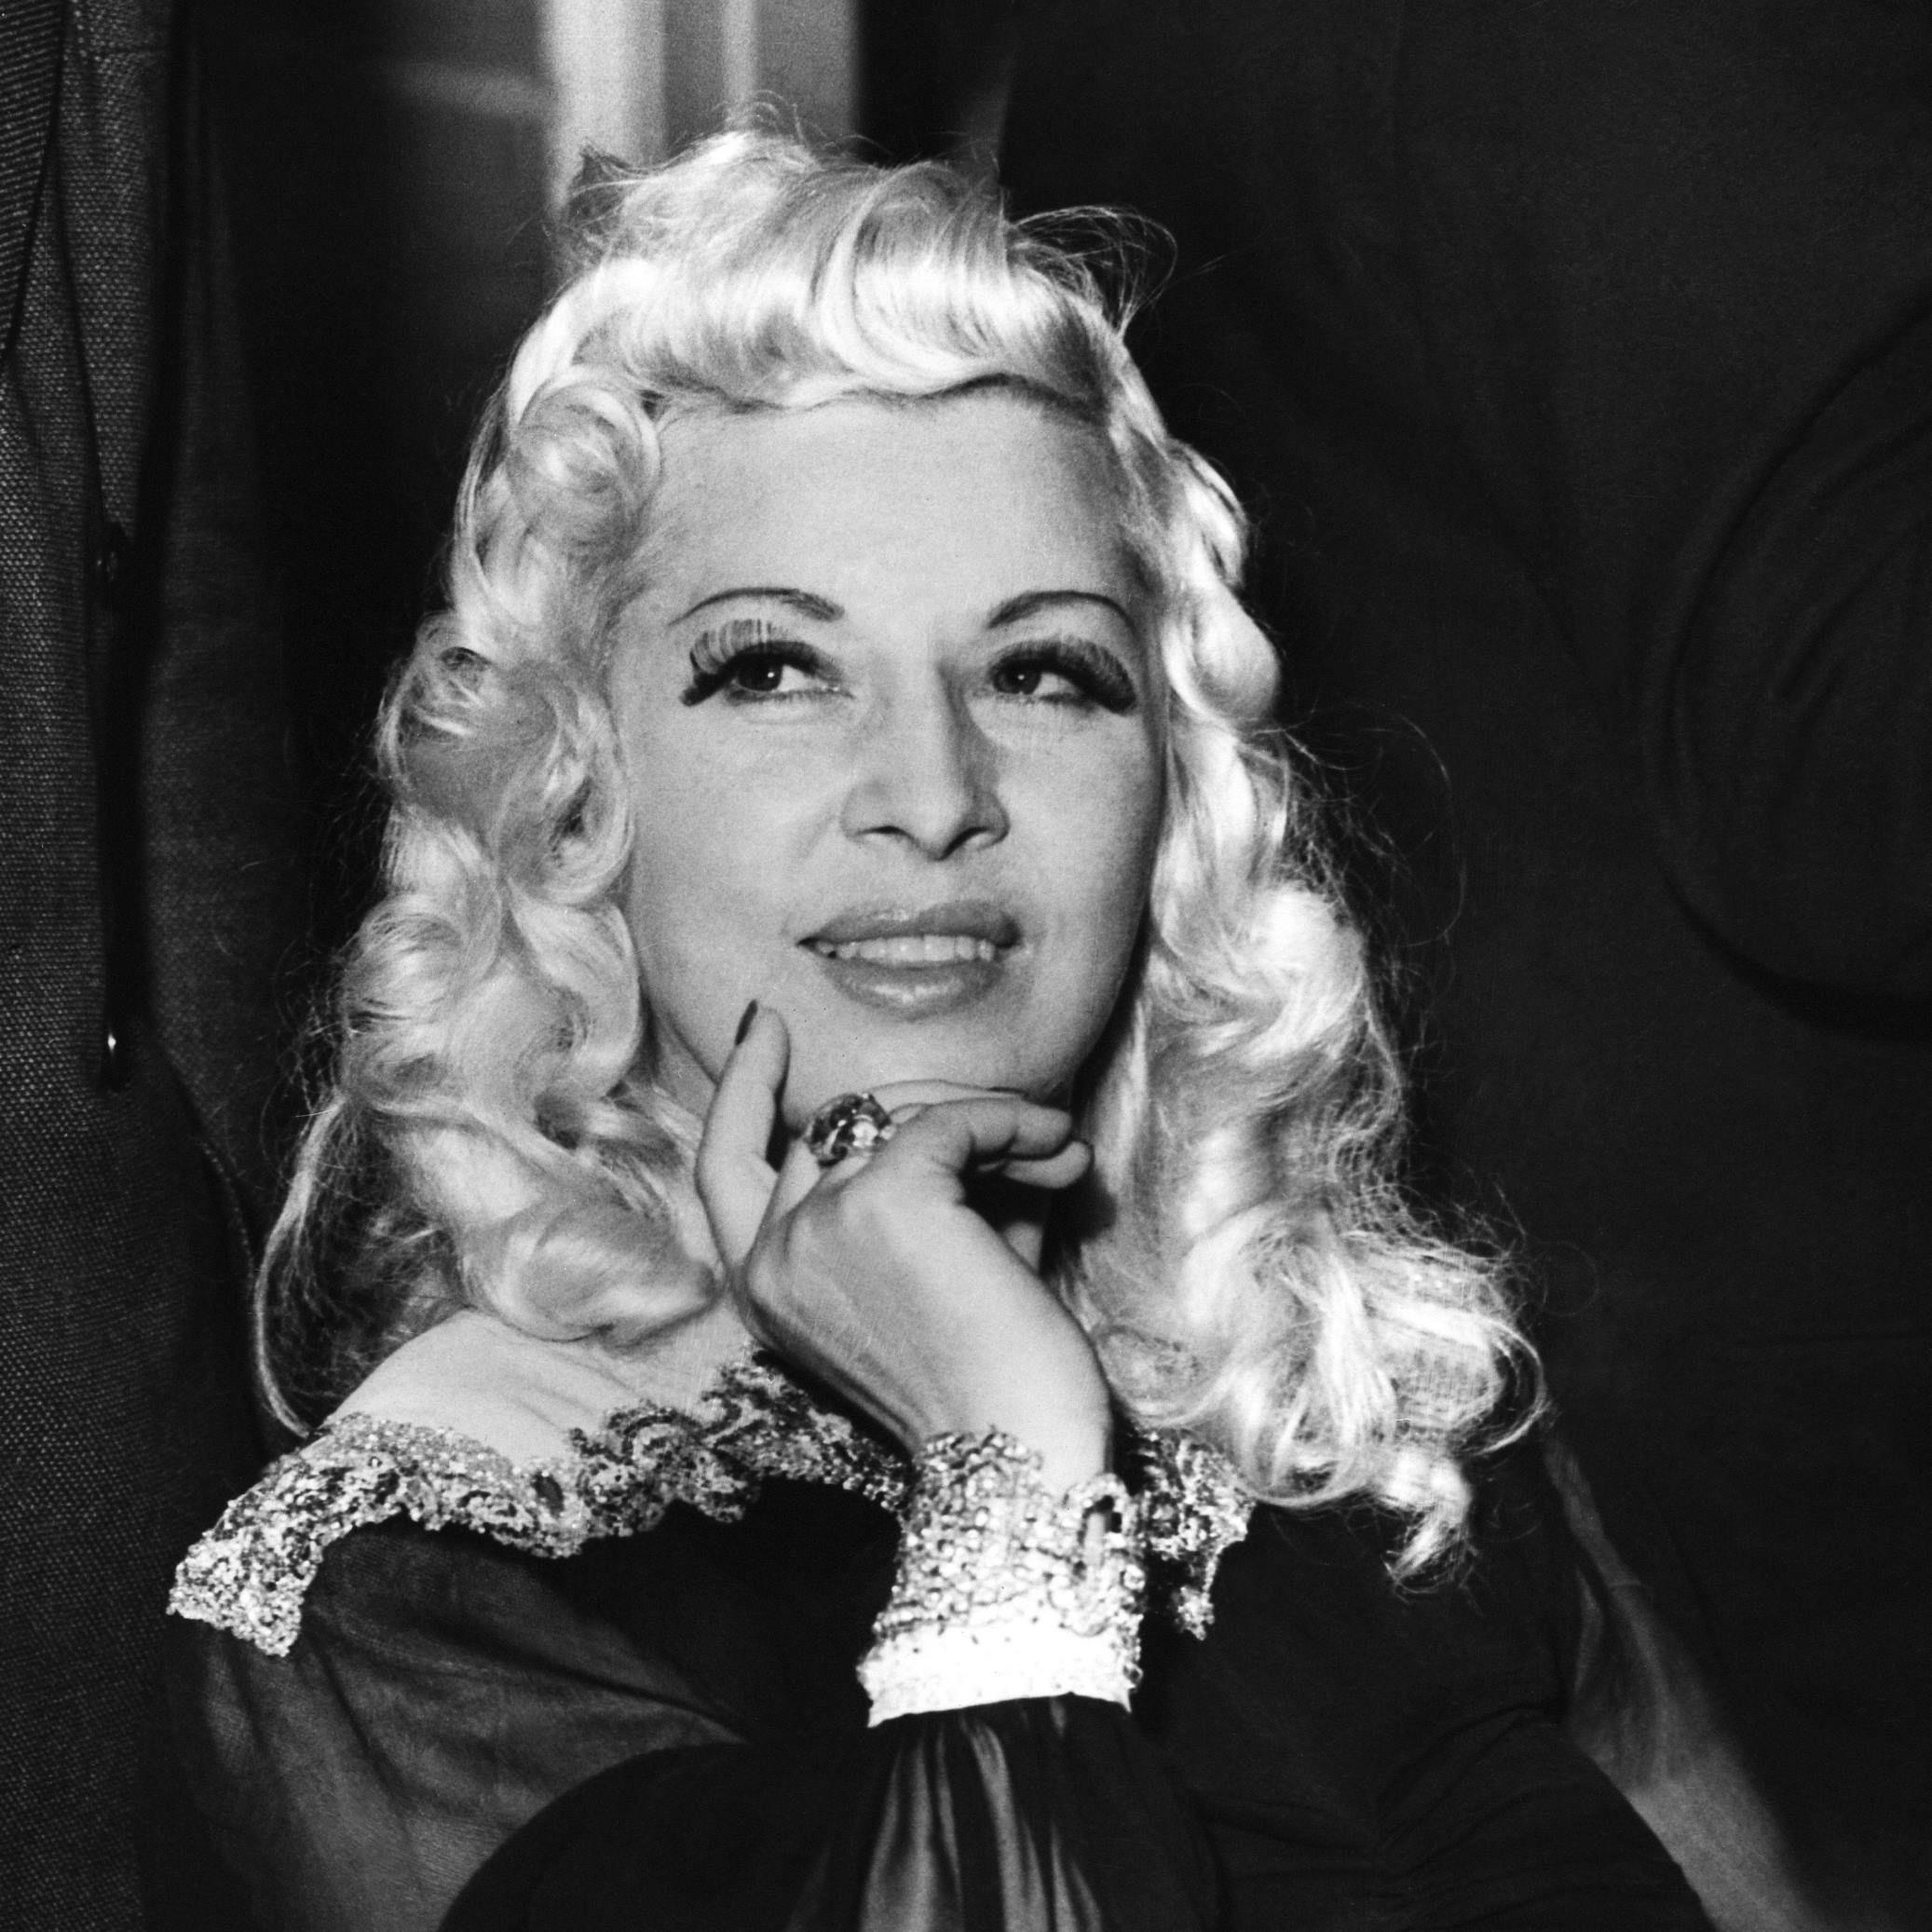 1960 Mae West at 69